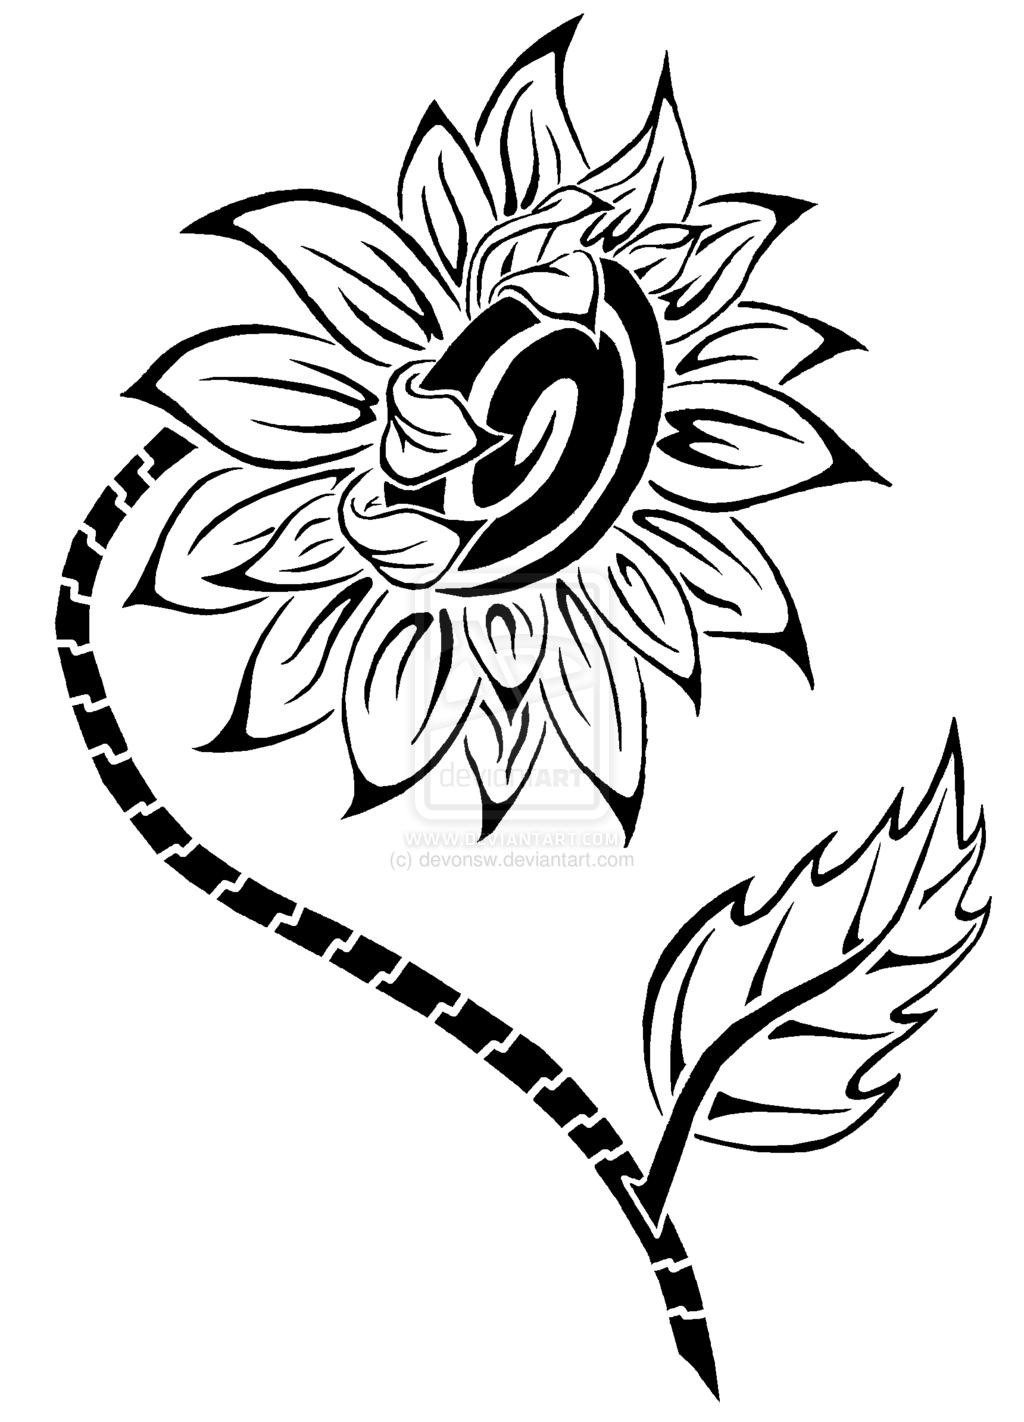 Sunflower tattoo google search tattoo pinterest sunflowers